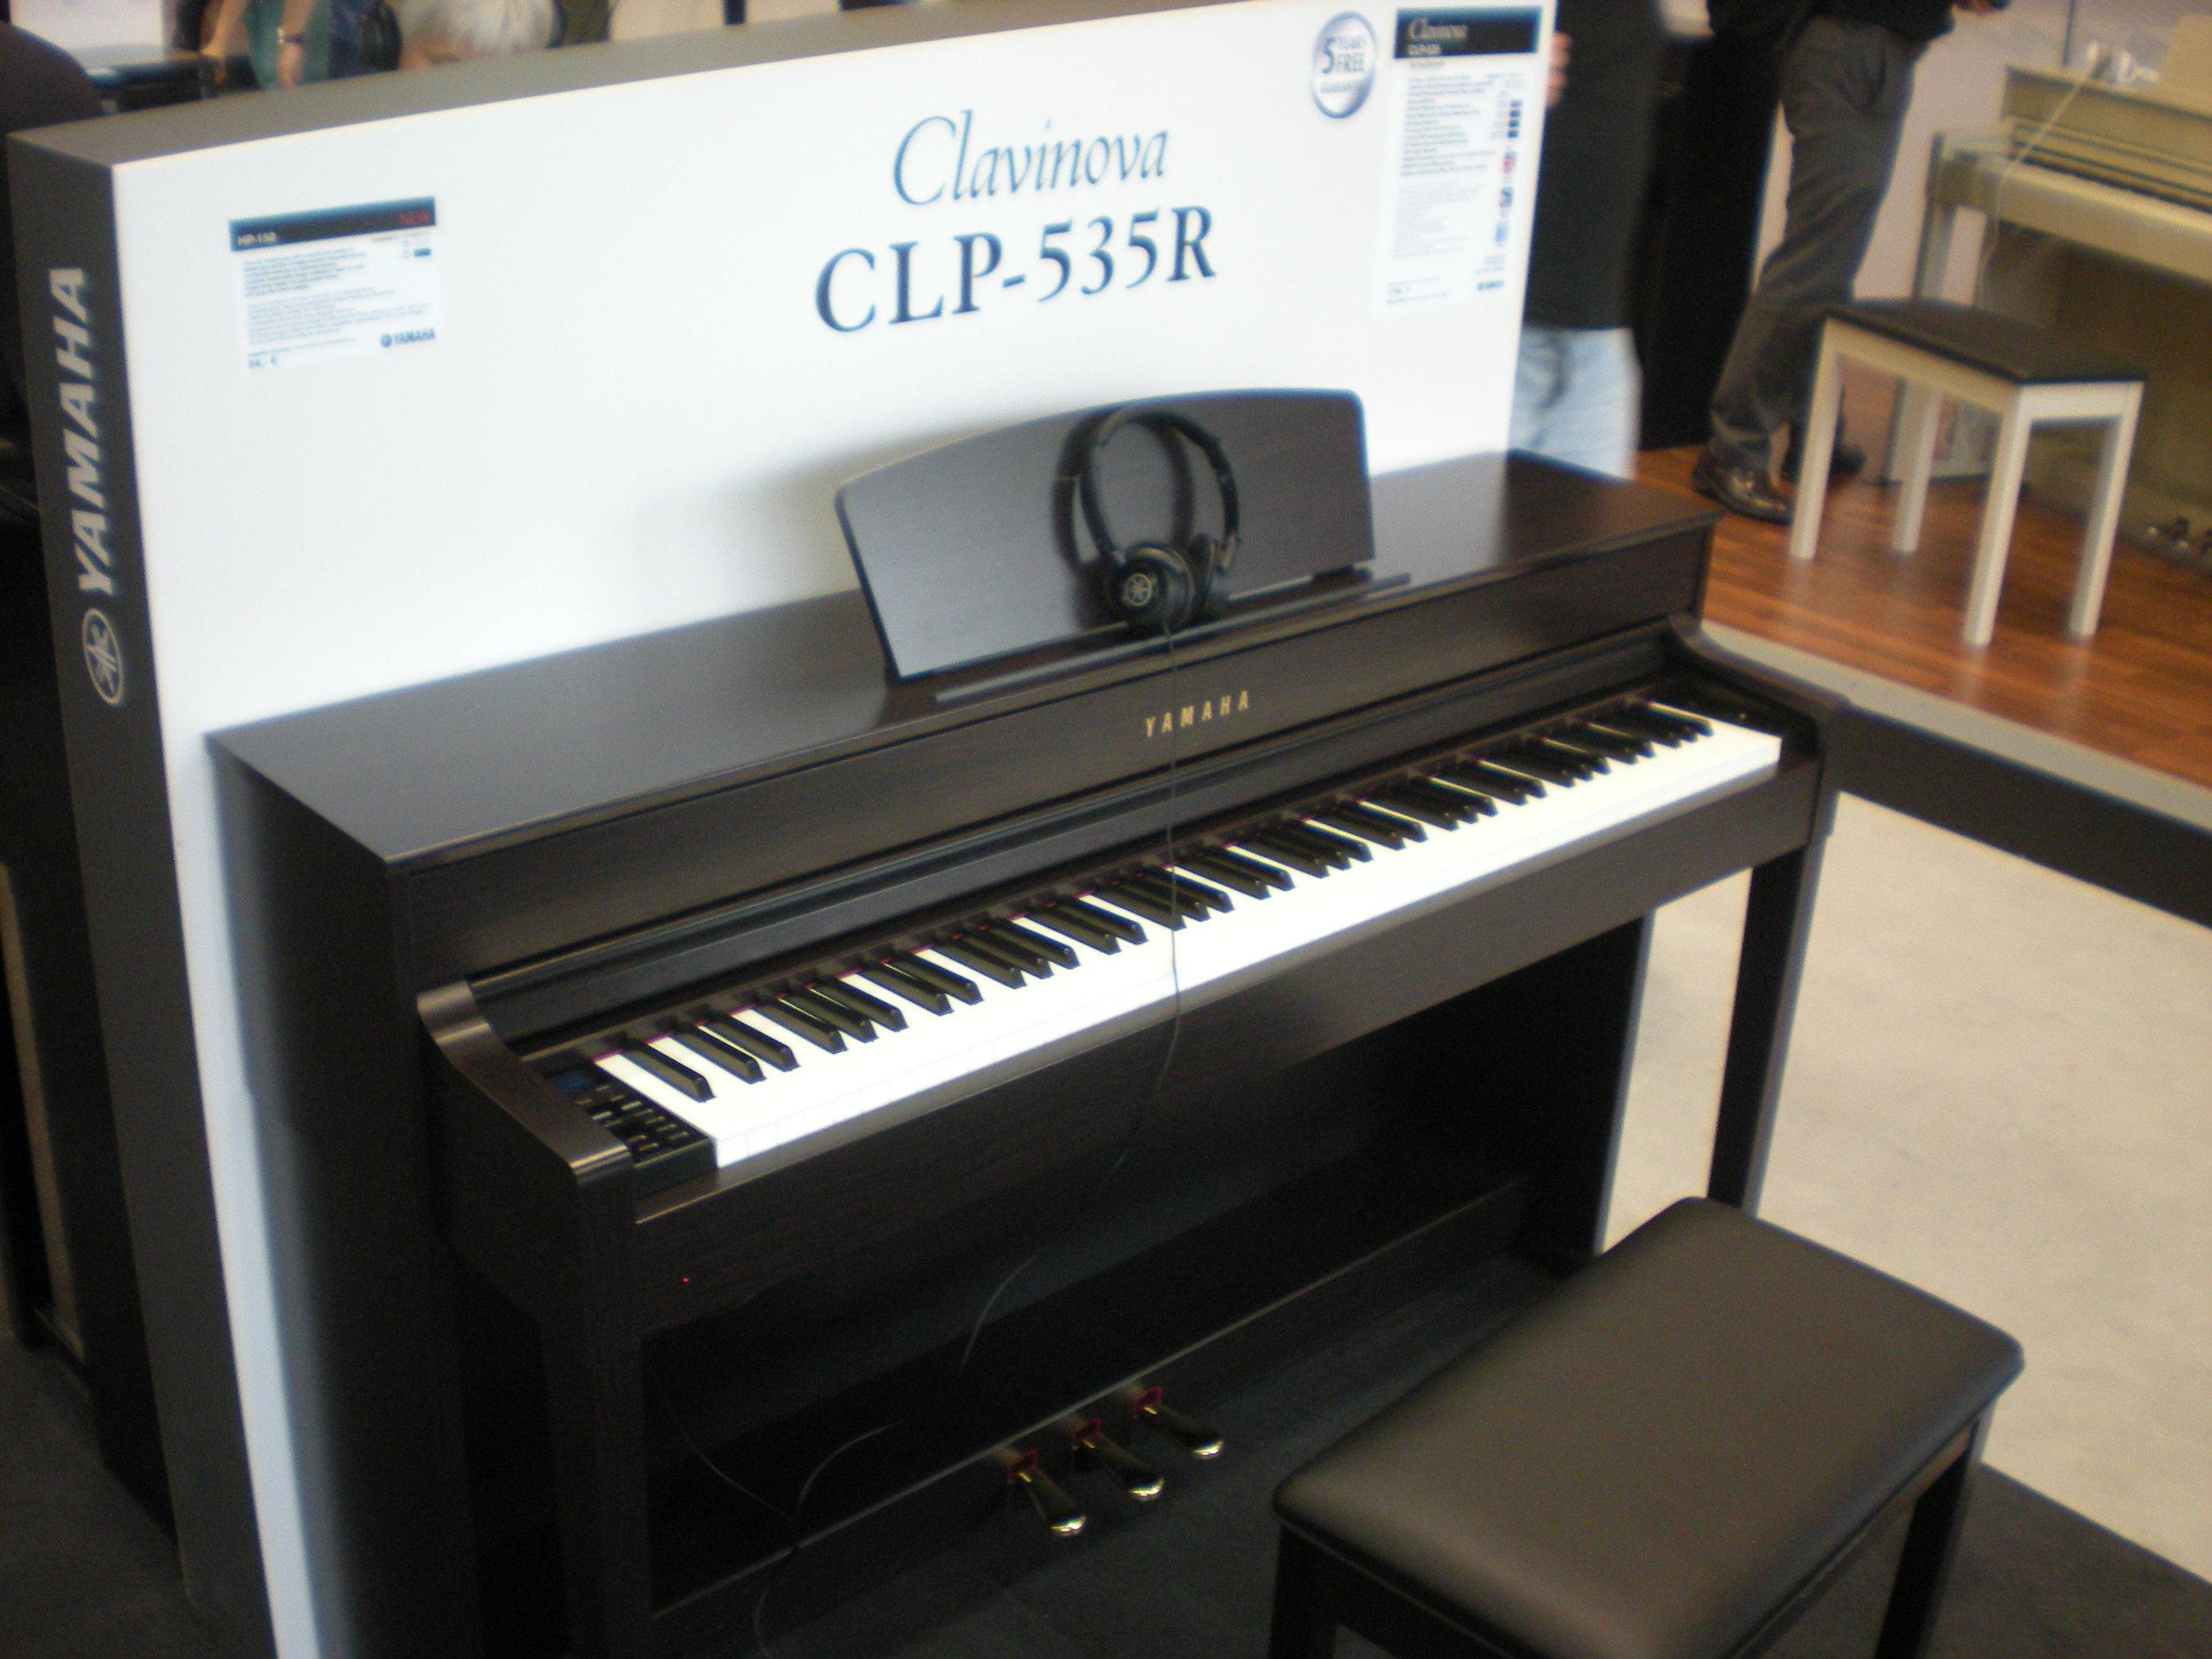 Clavinova CLP-535